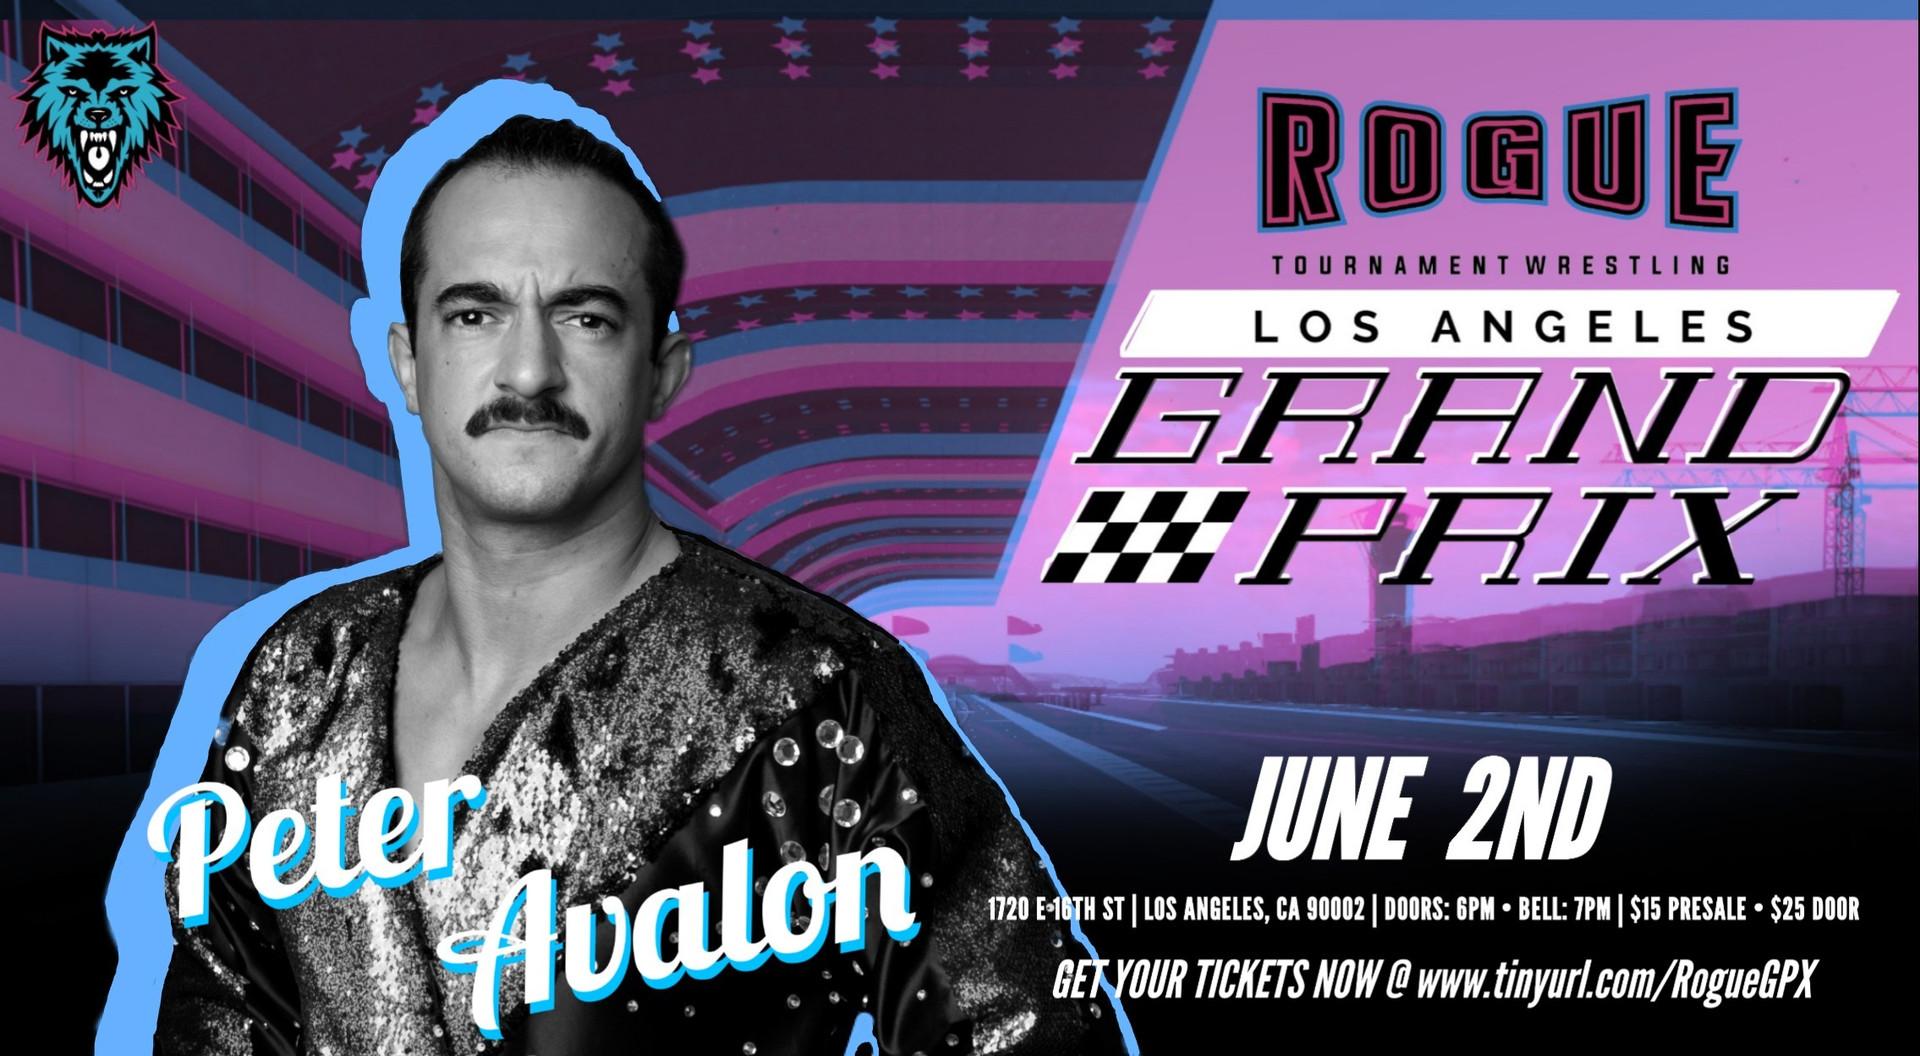 Peter_Avalon_Rogue_Wrestling_Los Angeles